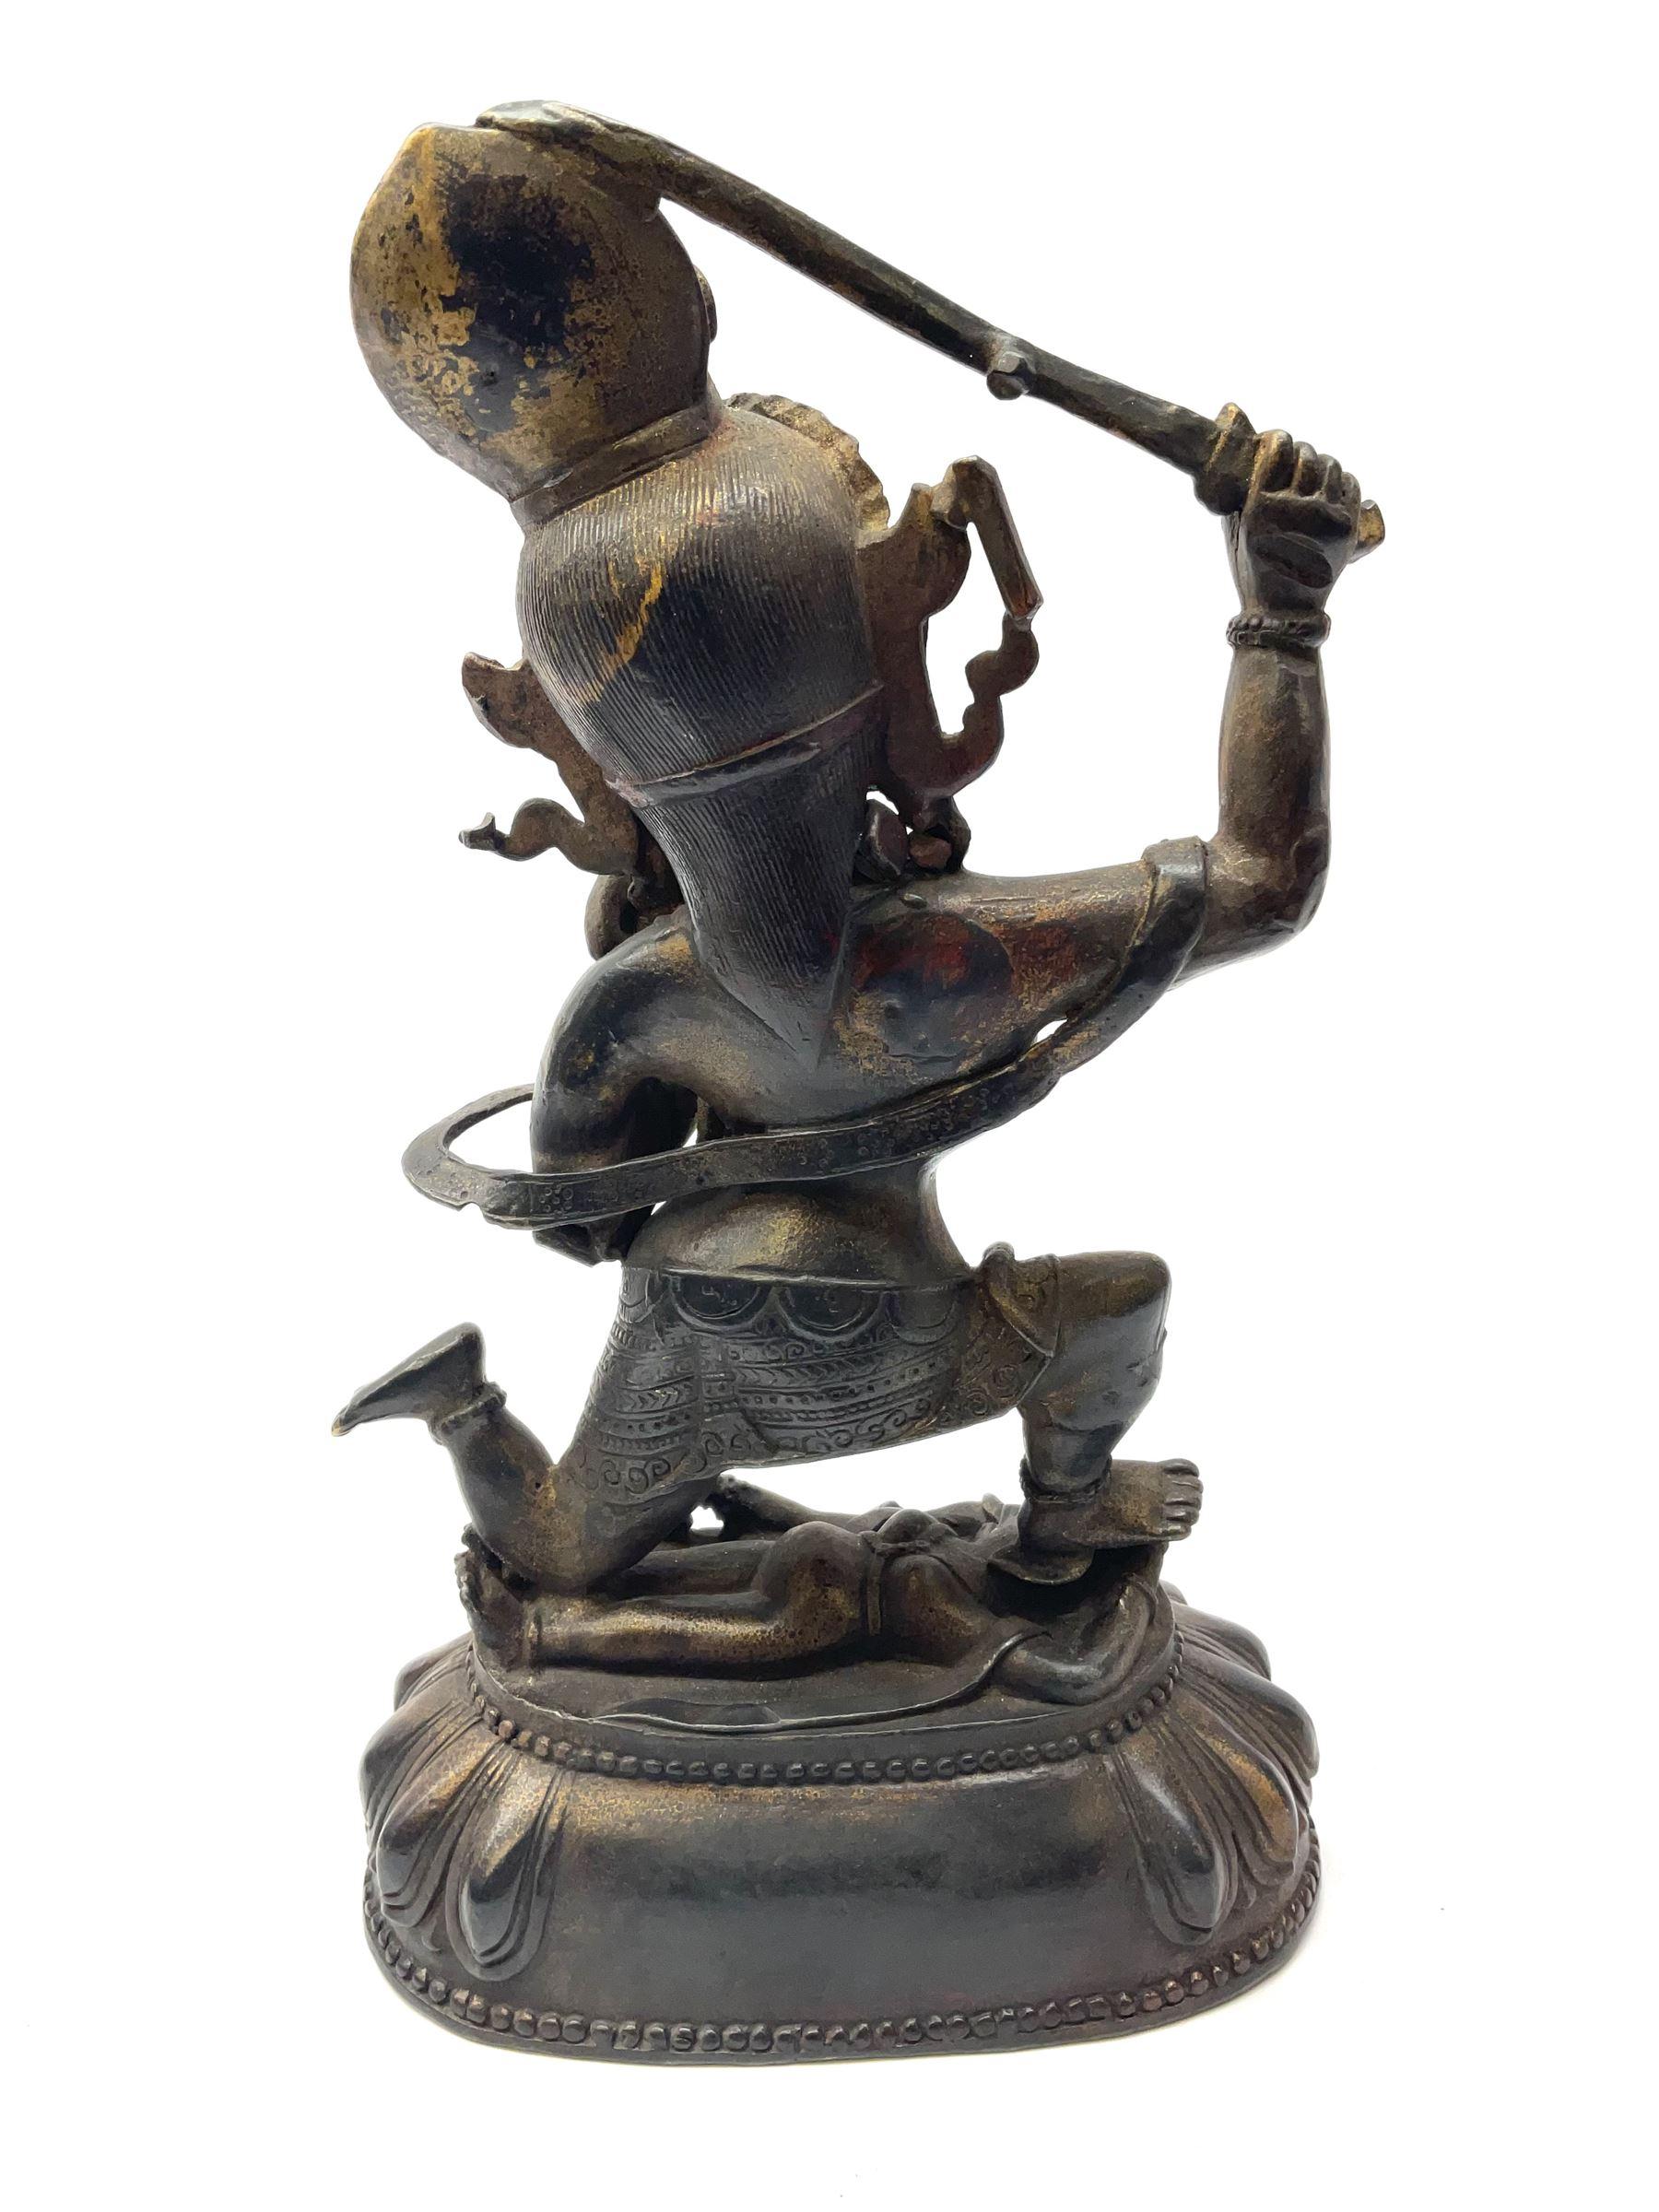 An eastern figure bronzed figure modelled as female deity kneeling upon figure - Image 2 of 2